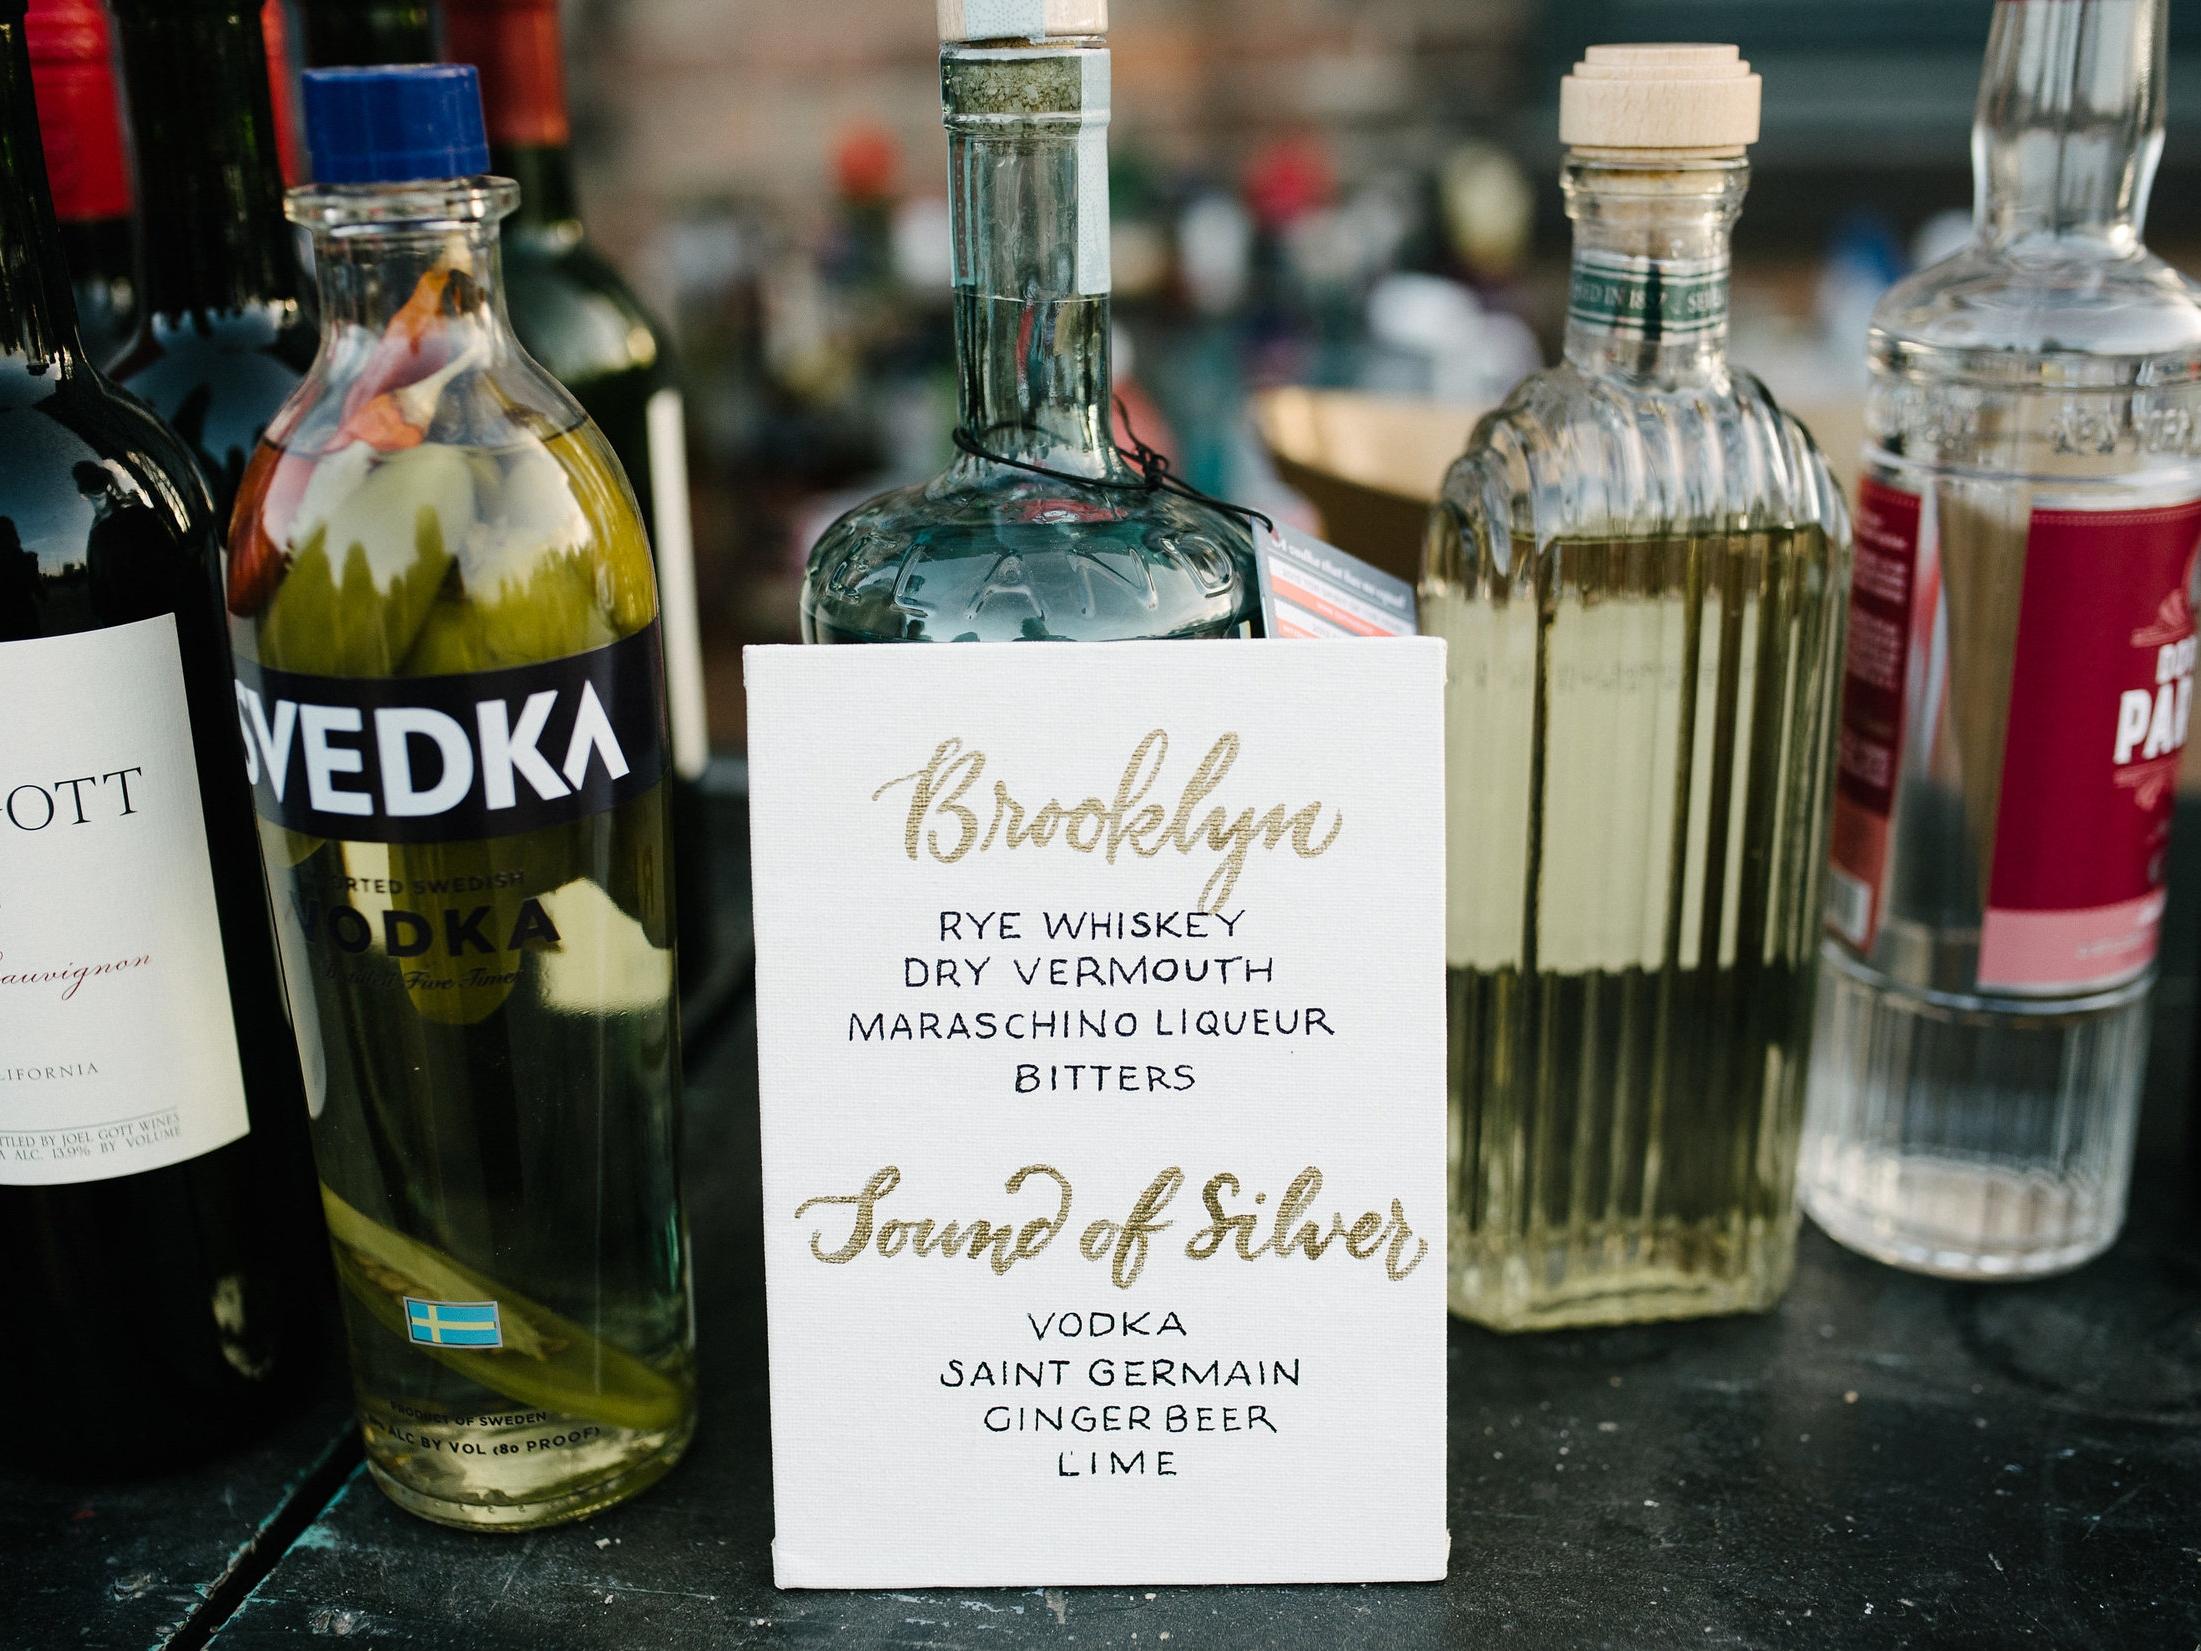 Signature cocktails wedding bar menu, hand-lettered // photography by www.lisahibbert.com